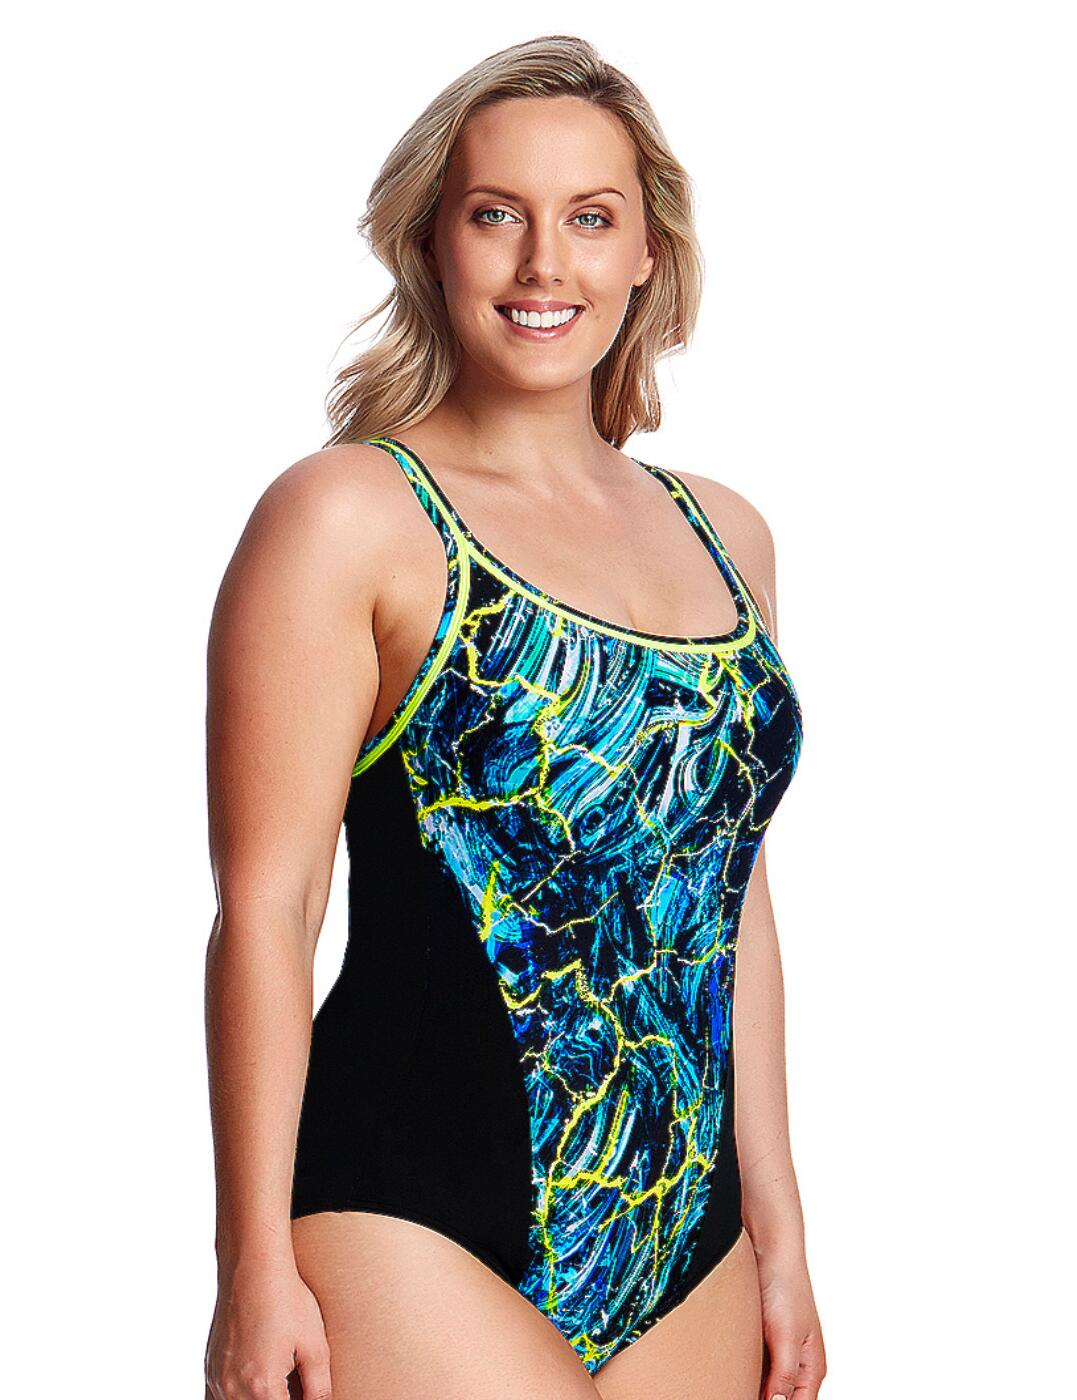 667e80fd3fd2f FS35L01986 Funkita Ladies Midnight Marble Locked In Lucy One Piece Swimsuit